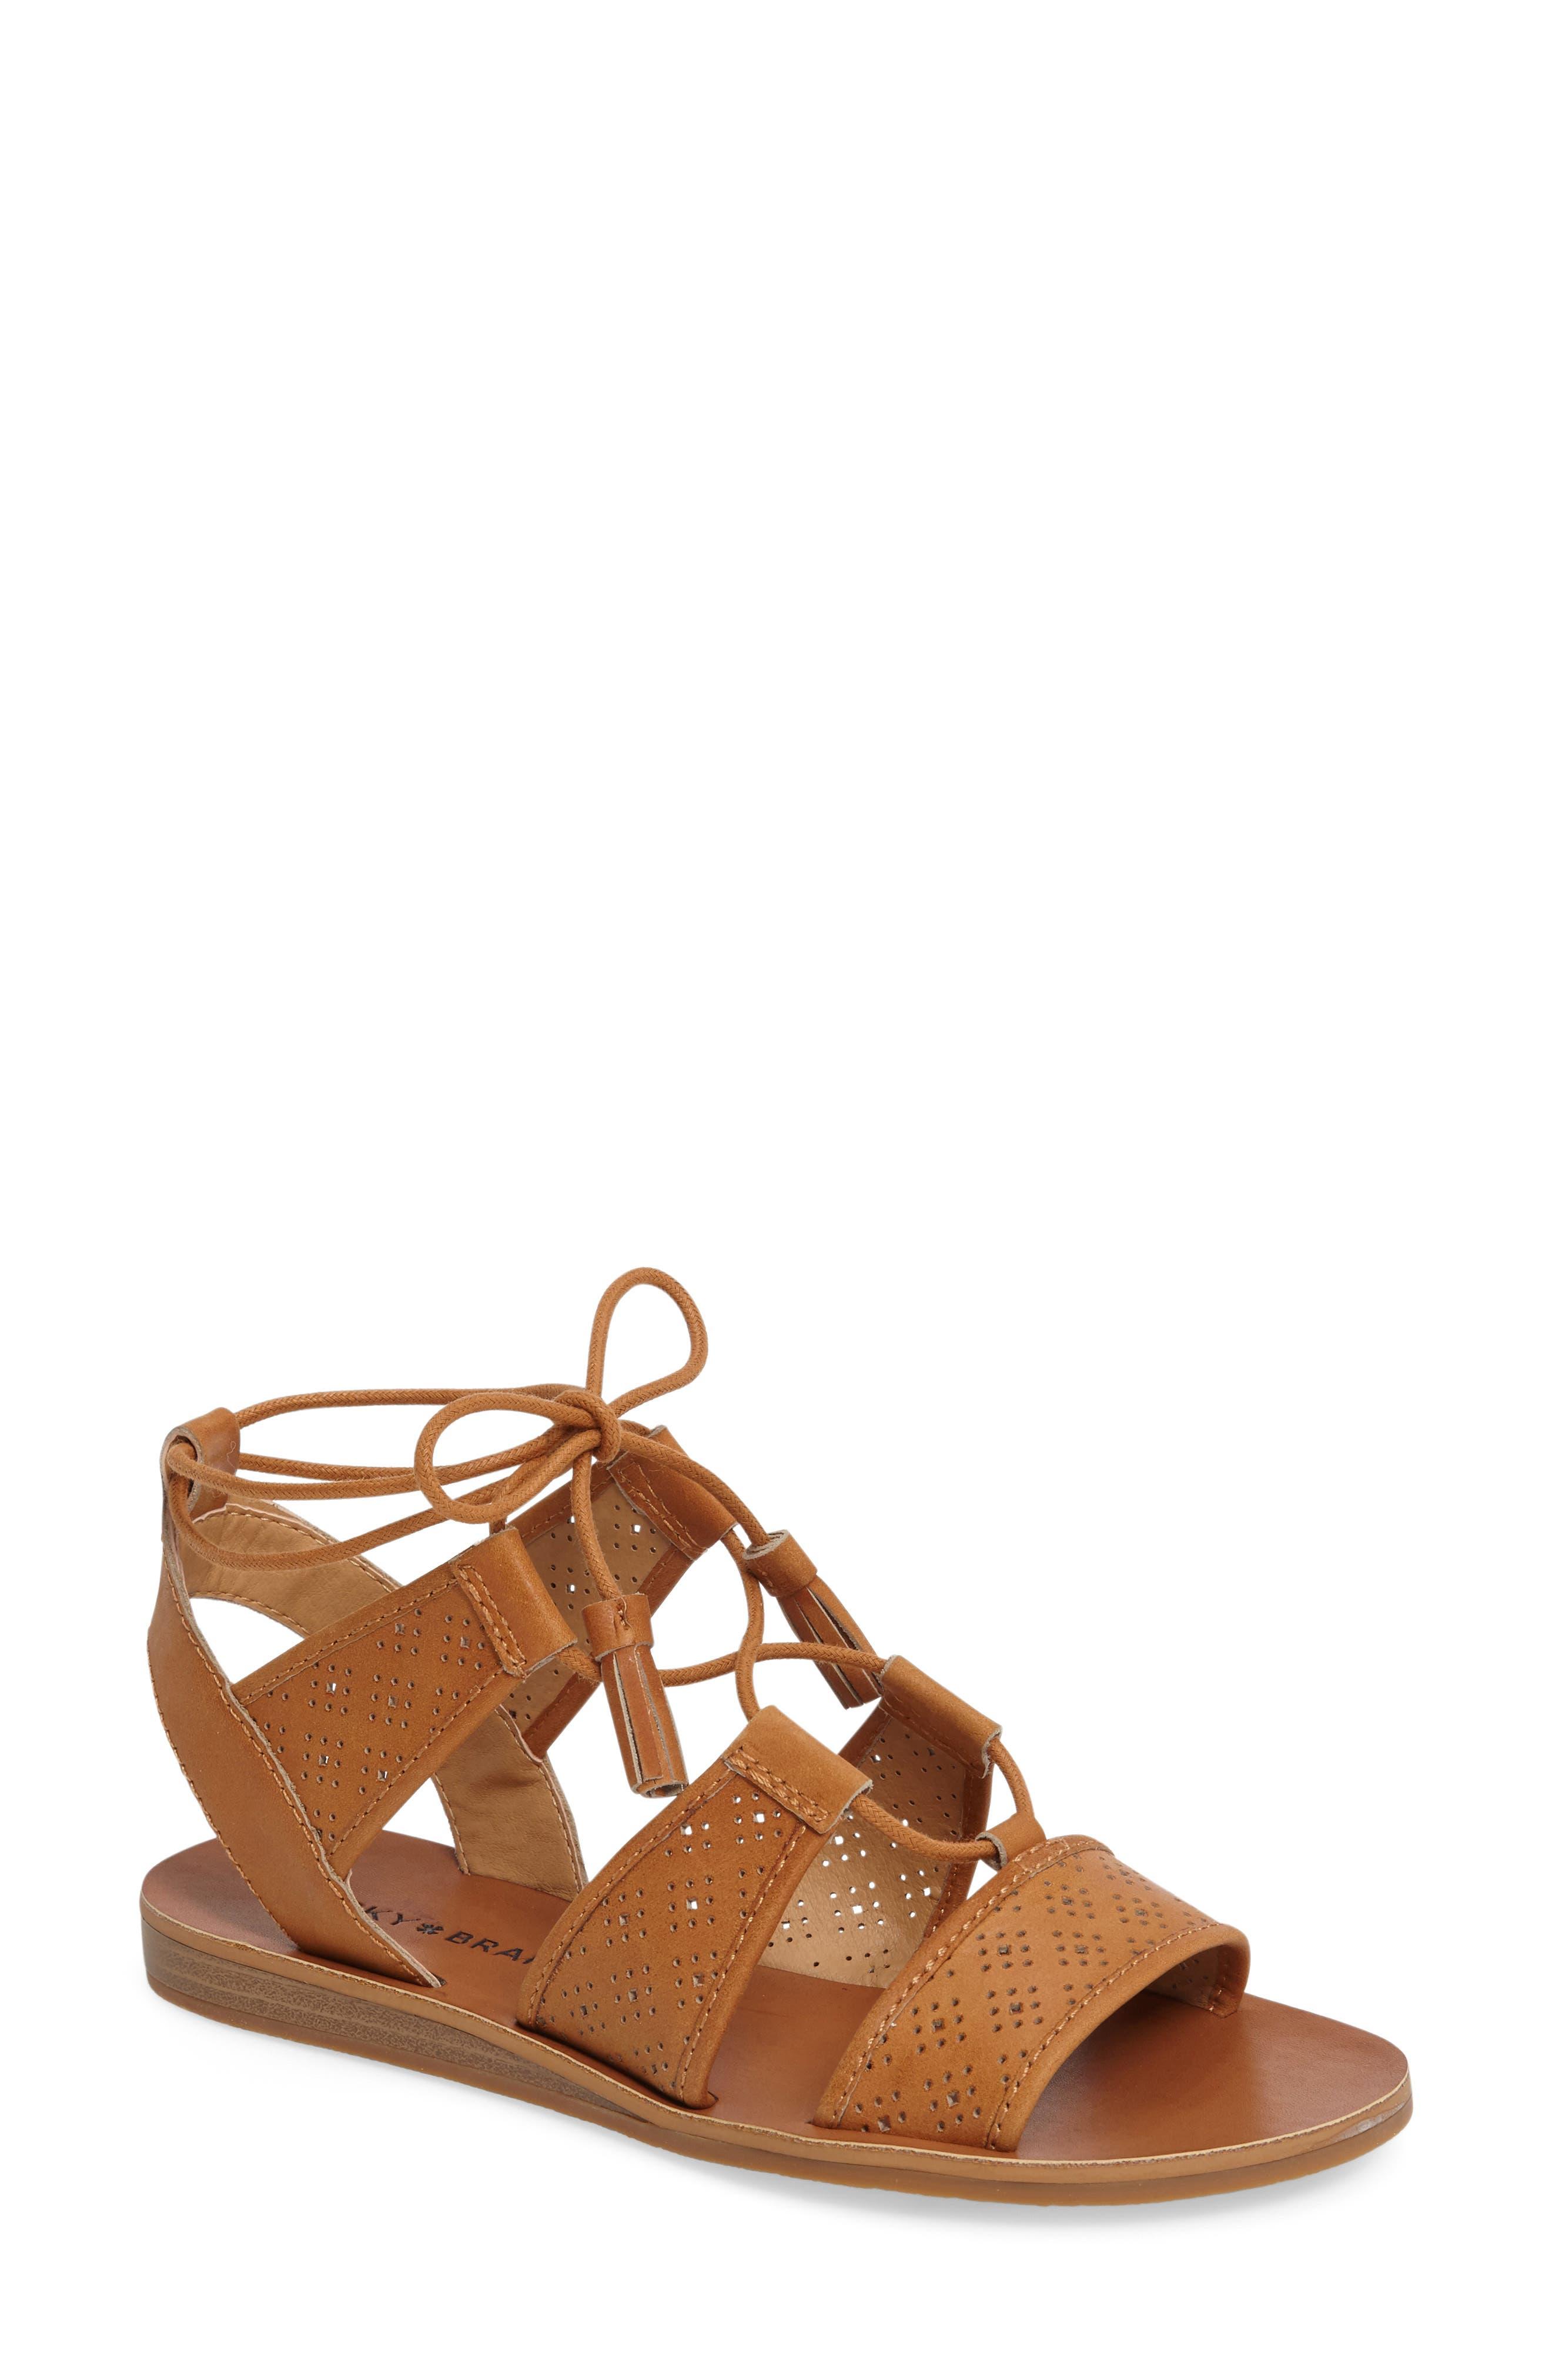 Brenny Sandal,                         Main,                         color, Cafe Leather